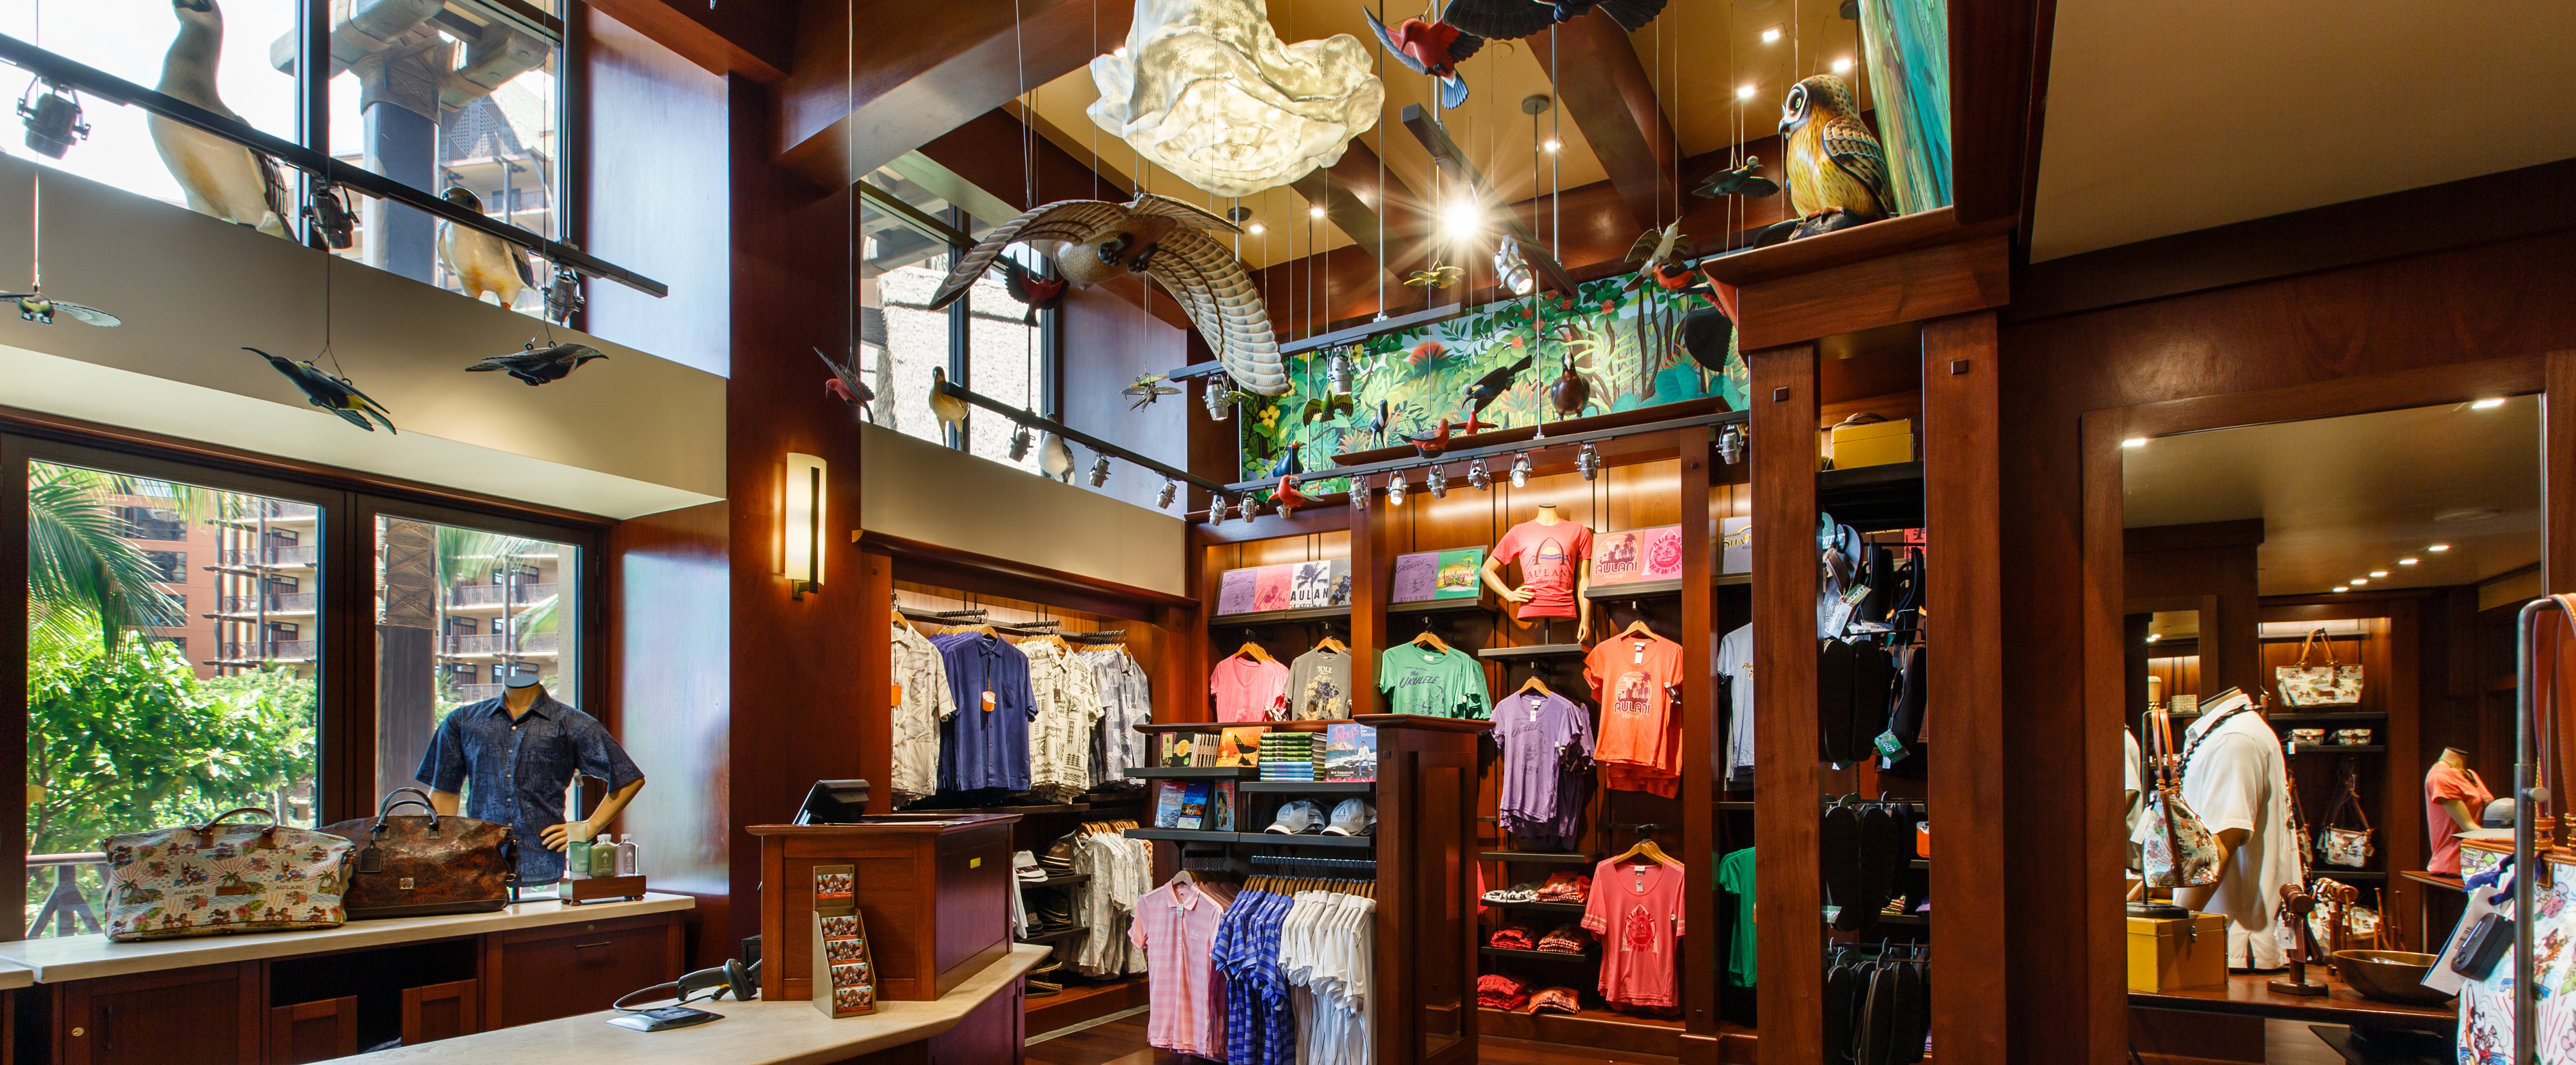 hale manu boutique aulani hawaii resort amp spa